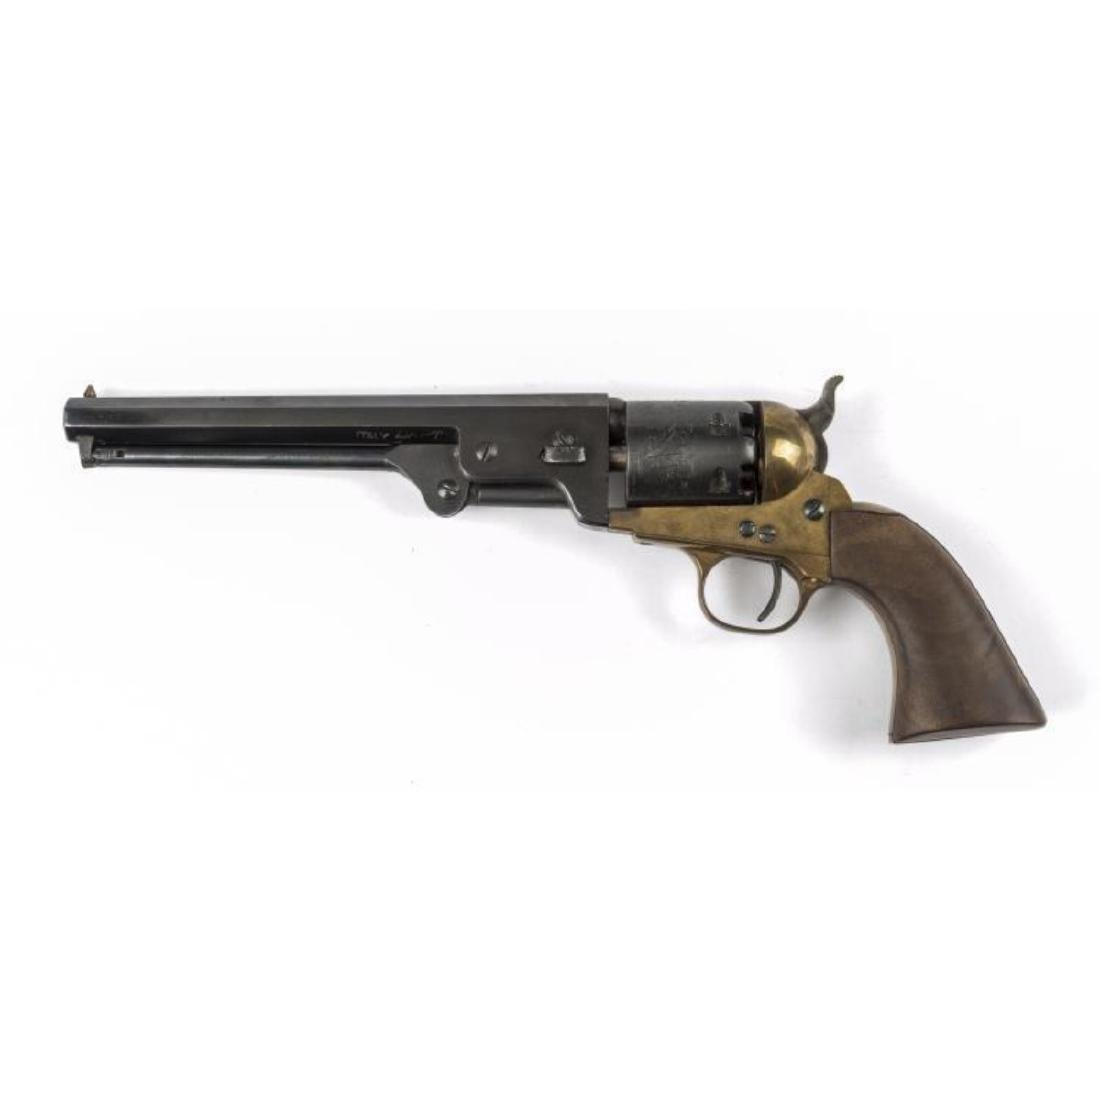 Italian Replica 1851 Navy Revolver - .36 Cal - 7